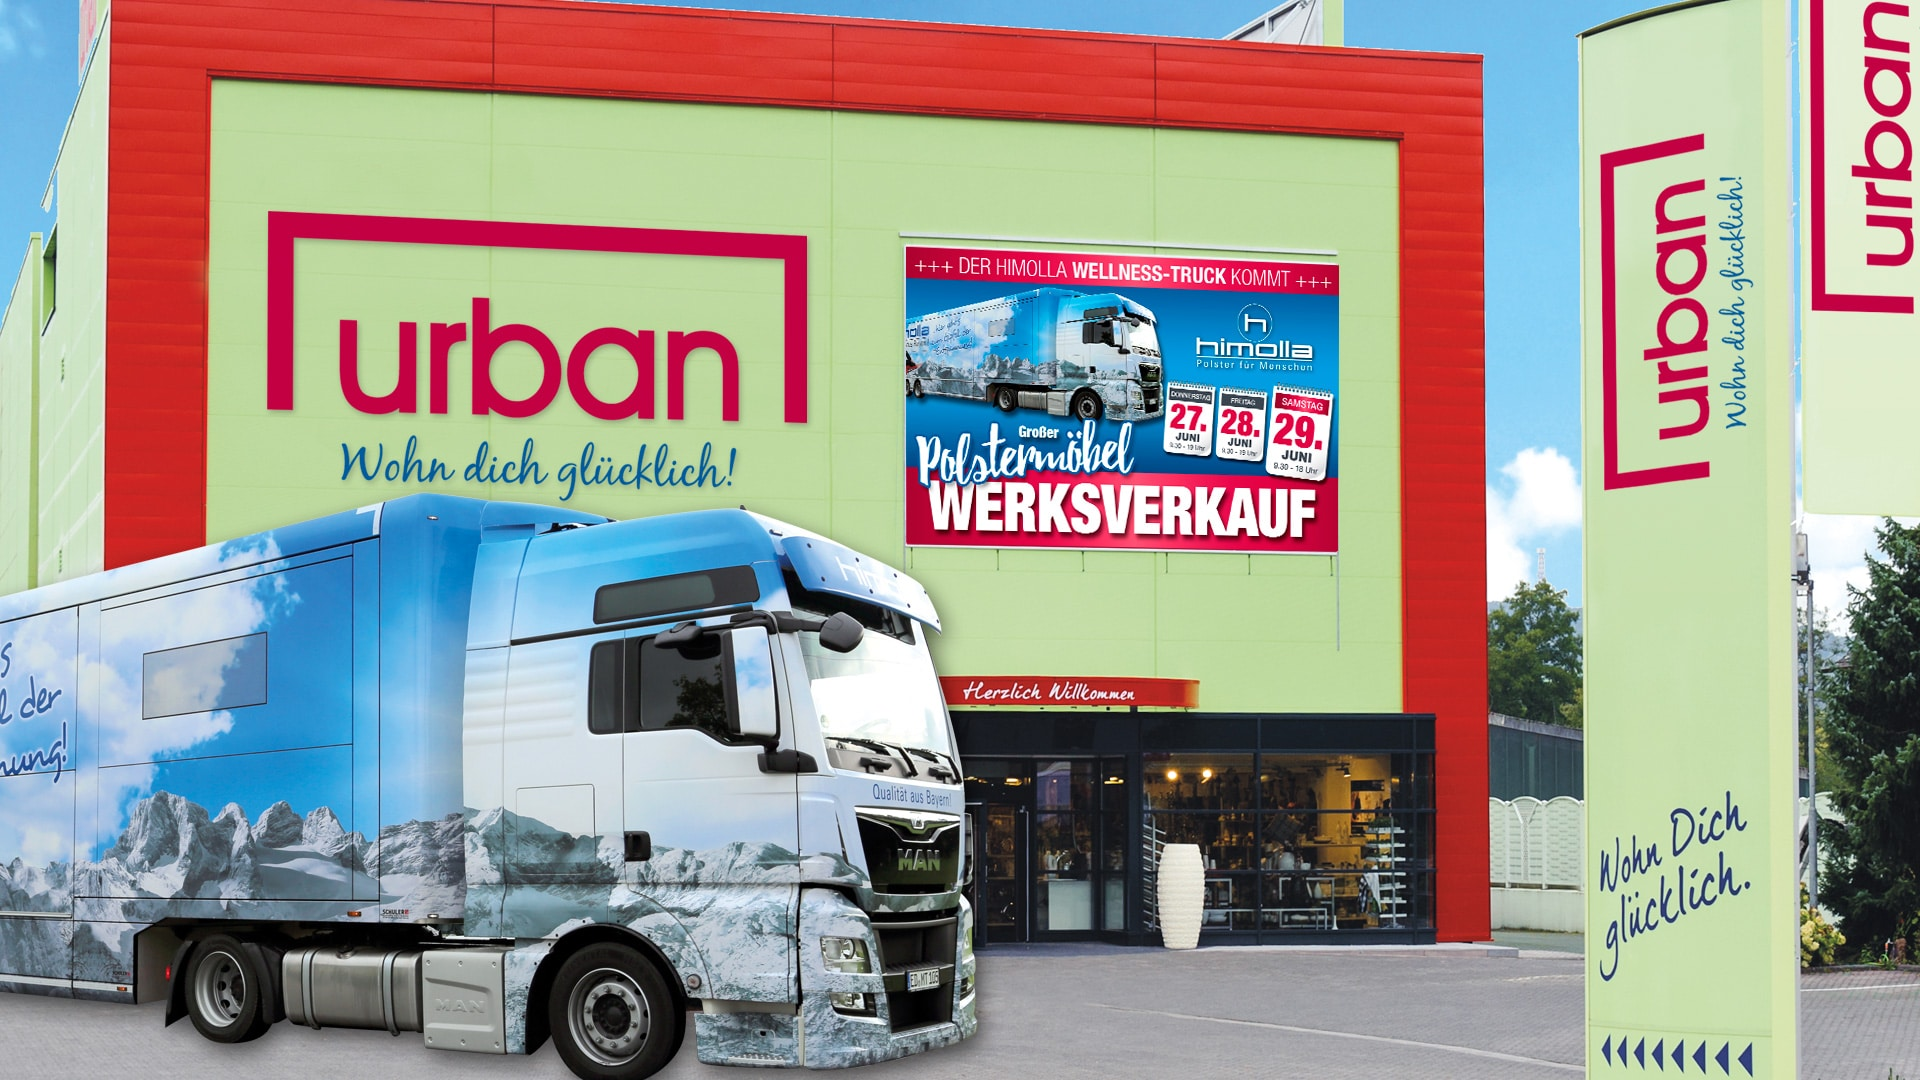 Der Himolla Truck Kommt Zu Mobel Urban